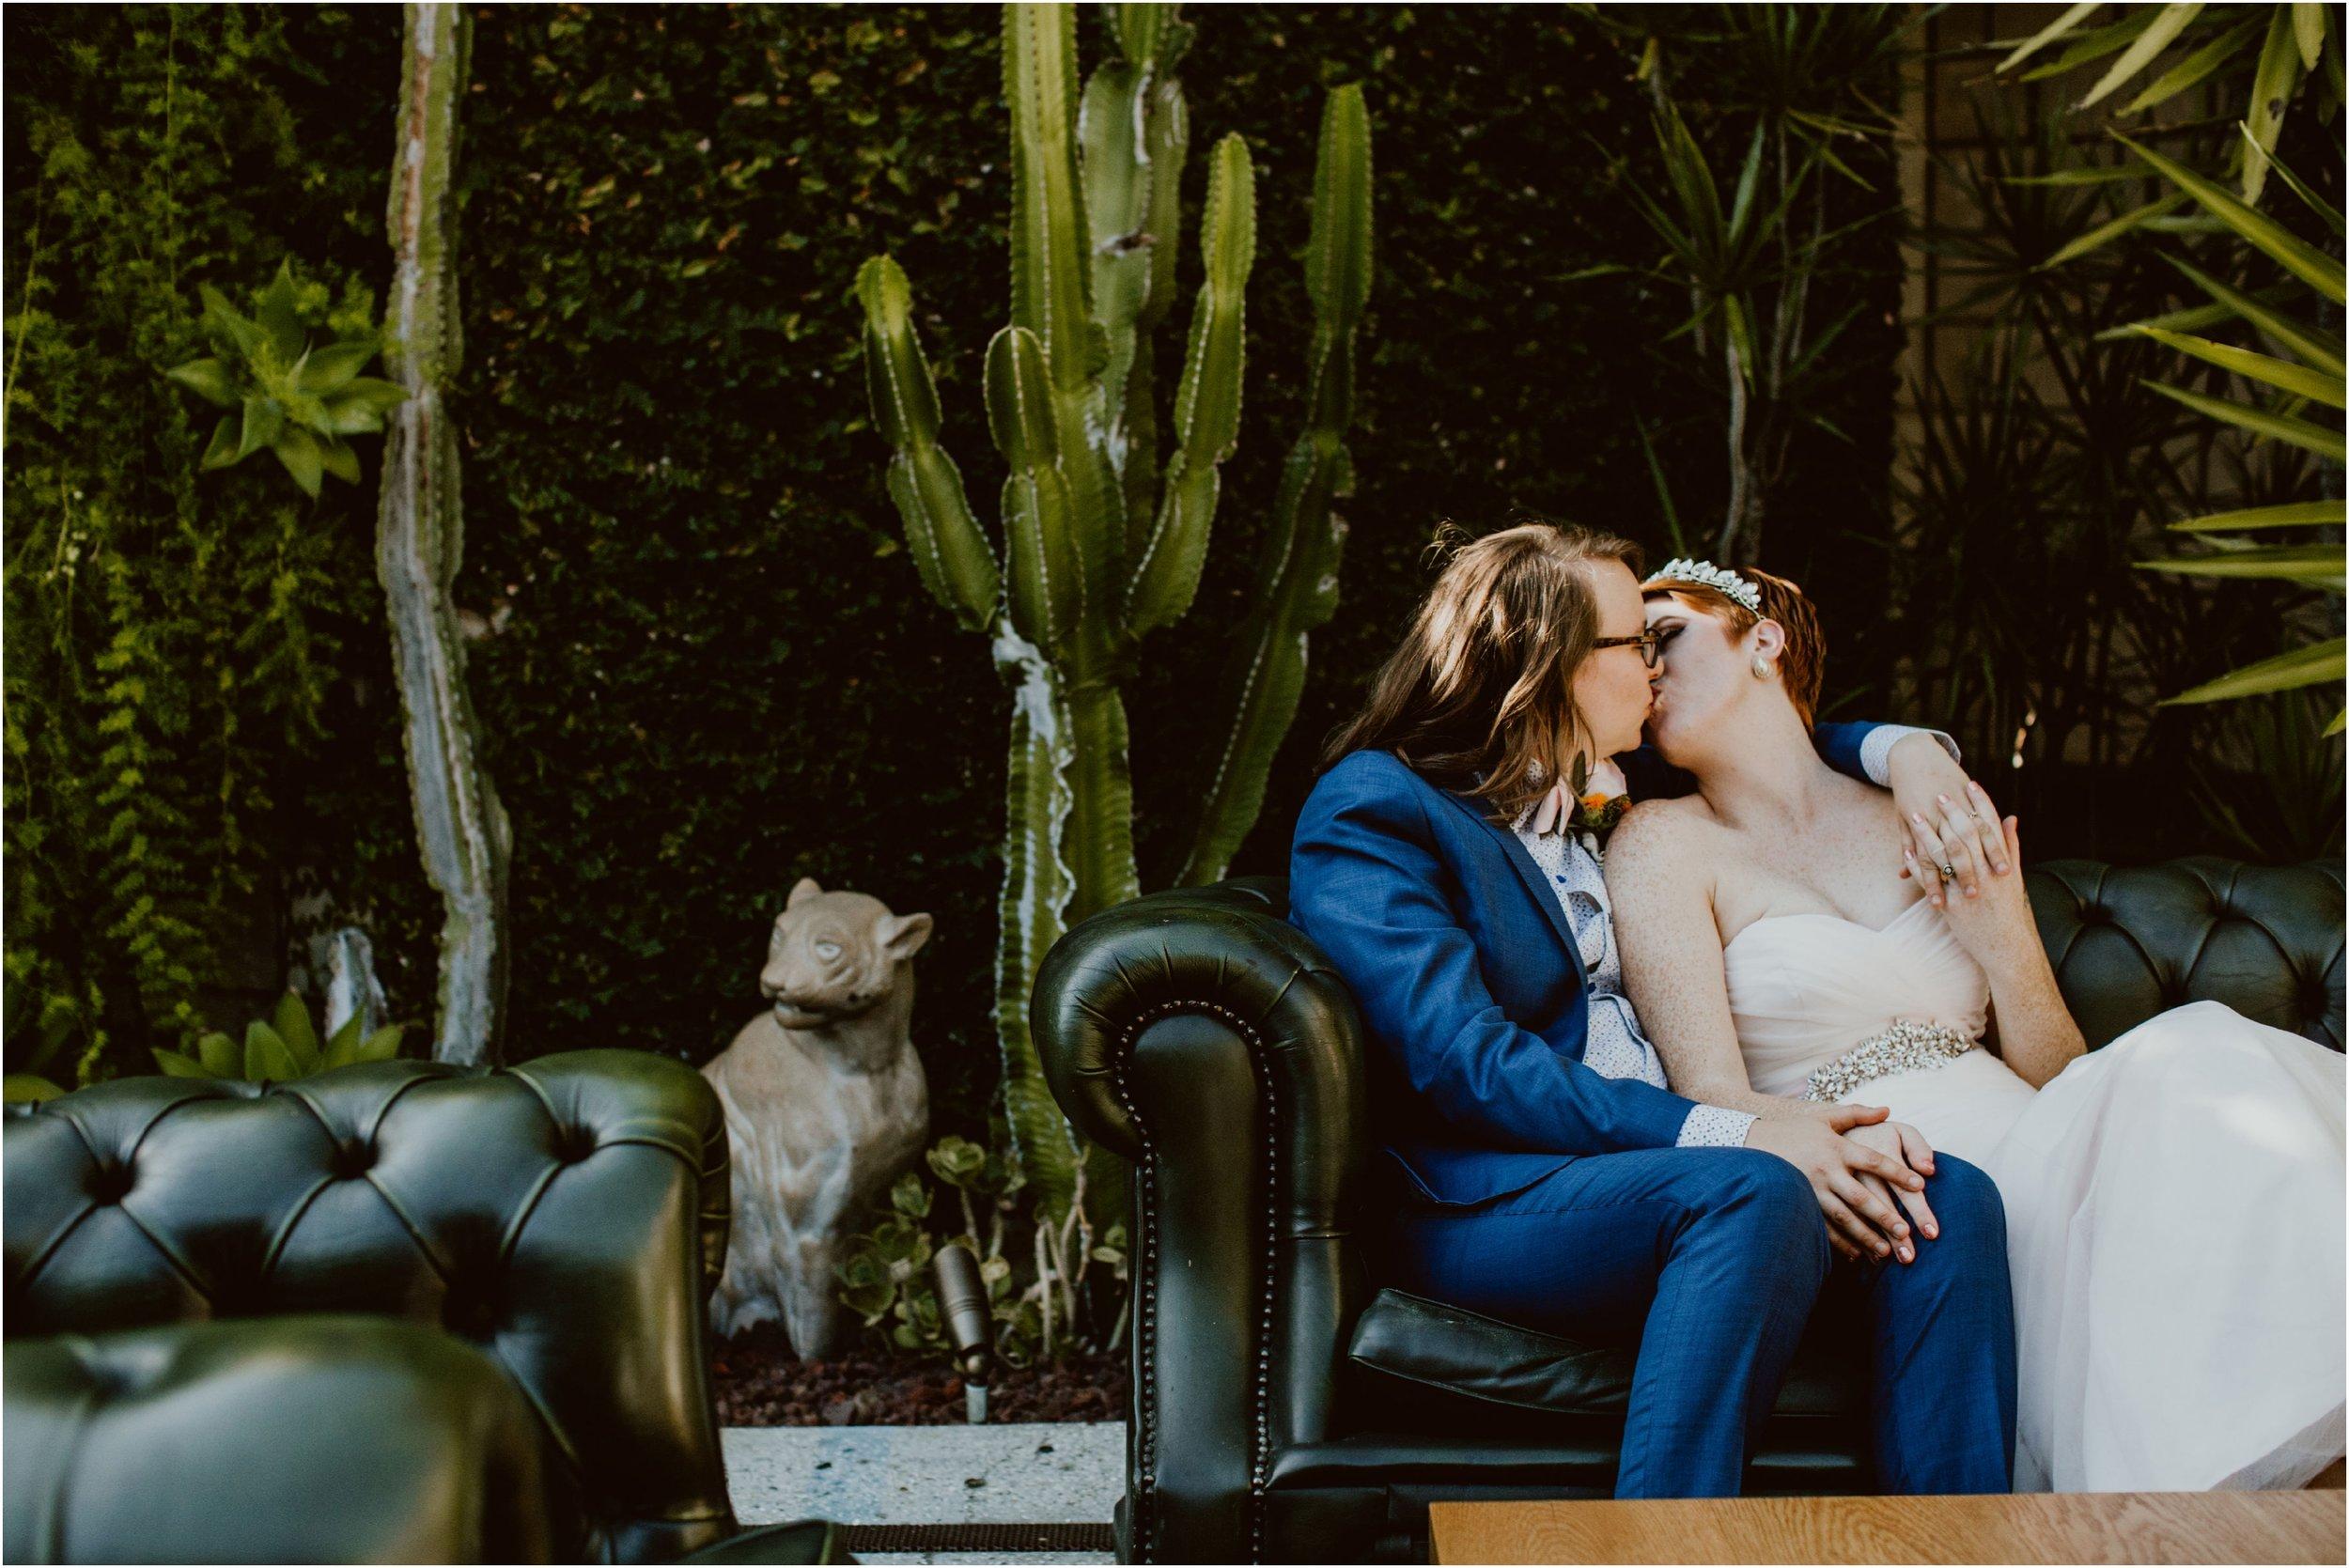 Smogshoppe-Wedding-S+C-Diana-Lake-Photography-624.jpg